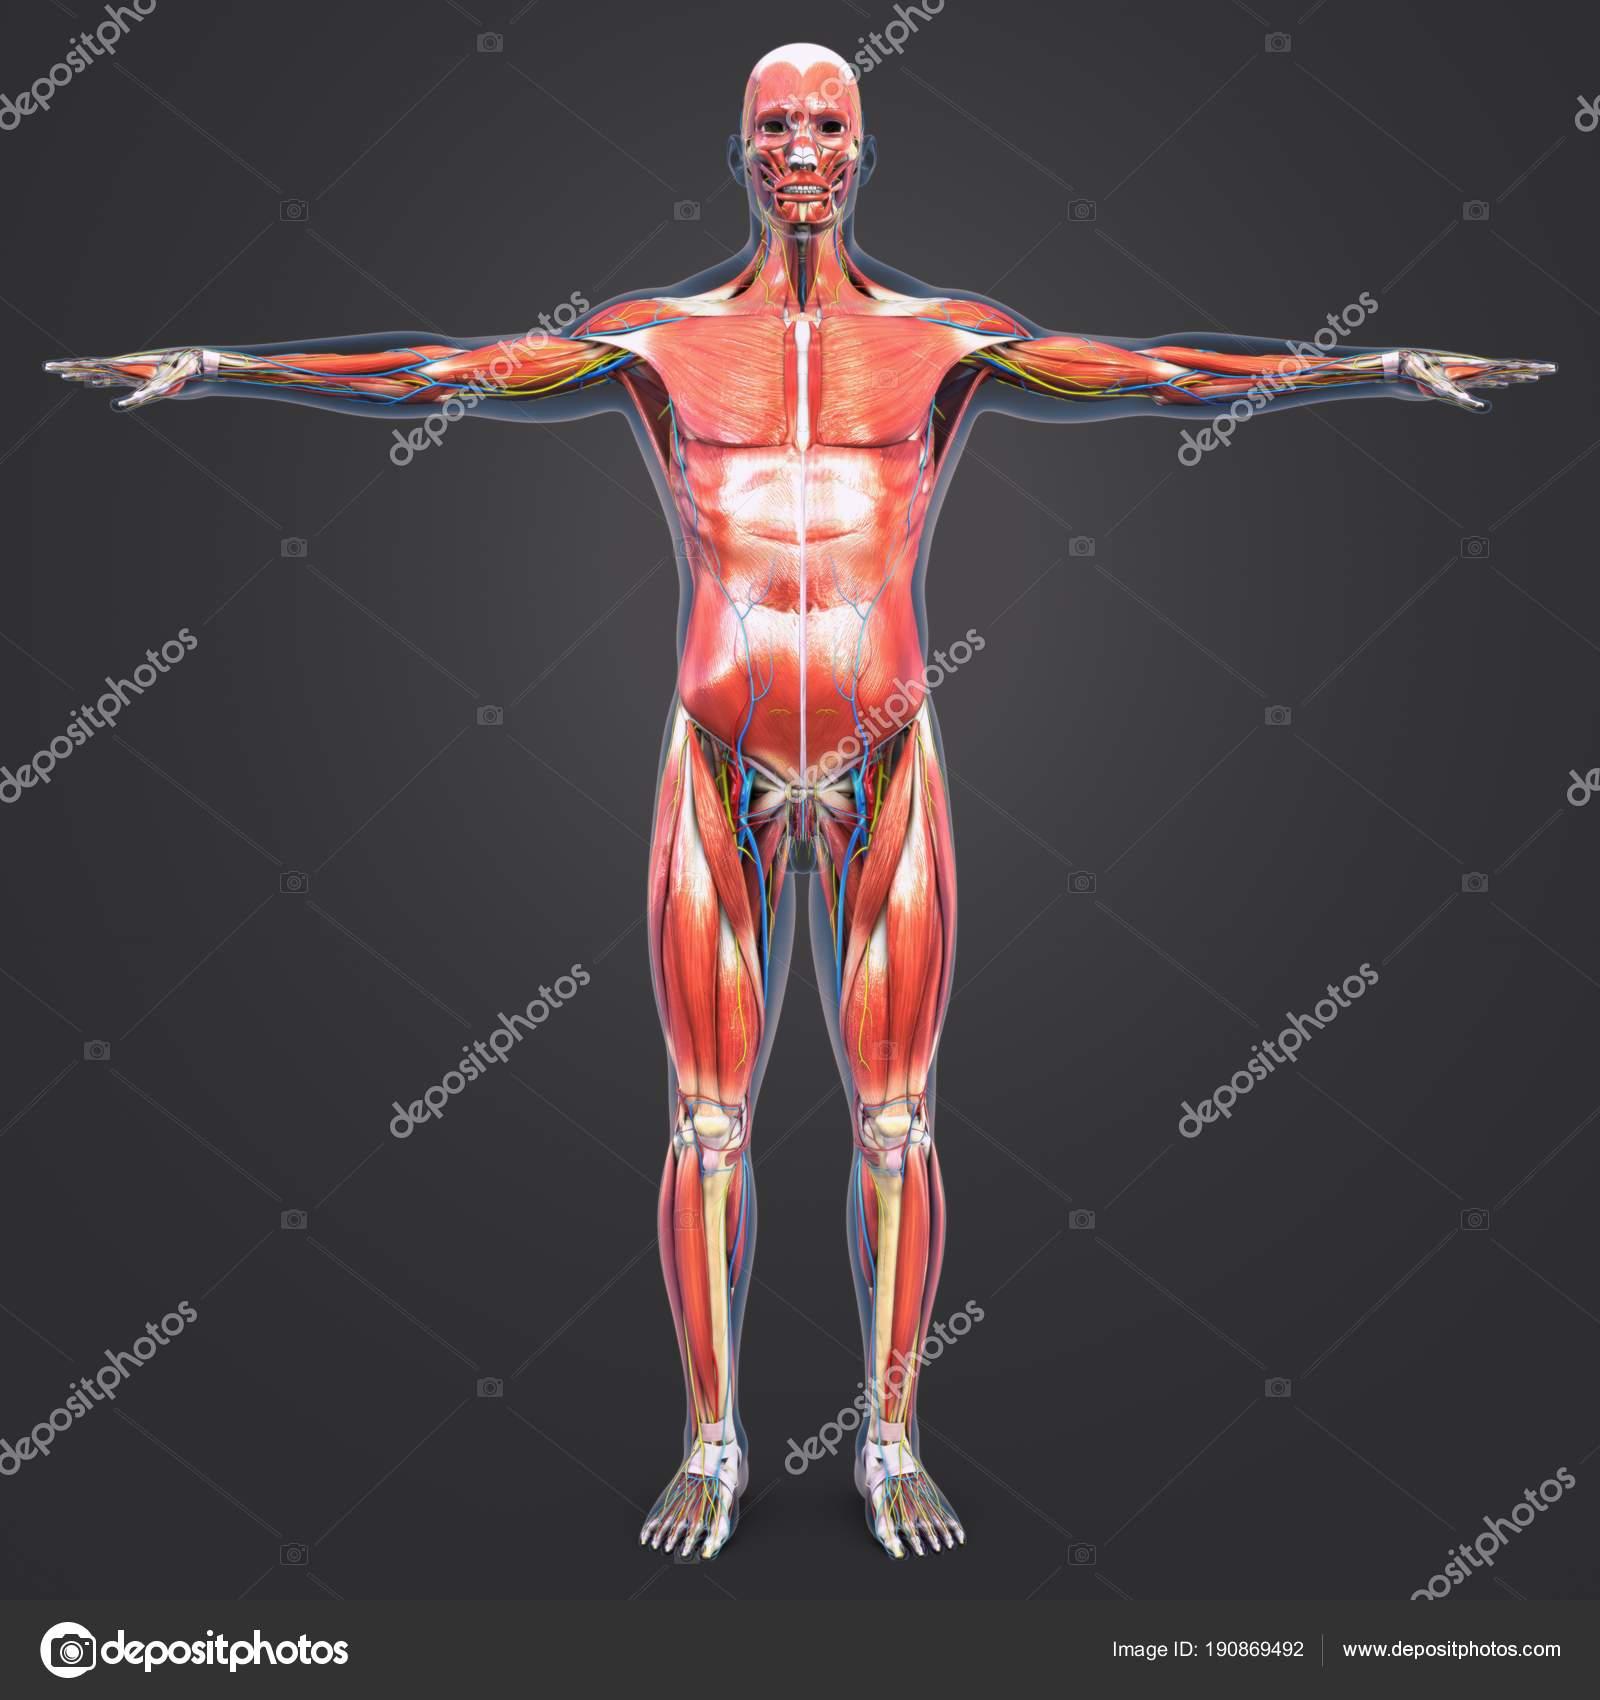 Colorida Ilustración Médica Muscular Humana Anatomía Esquelética Con ...